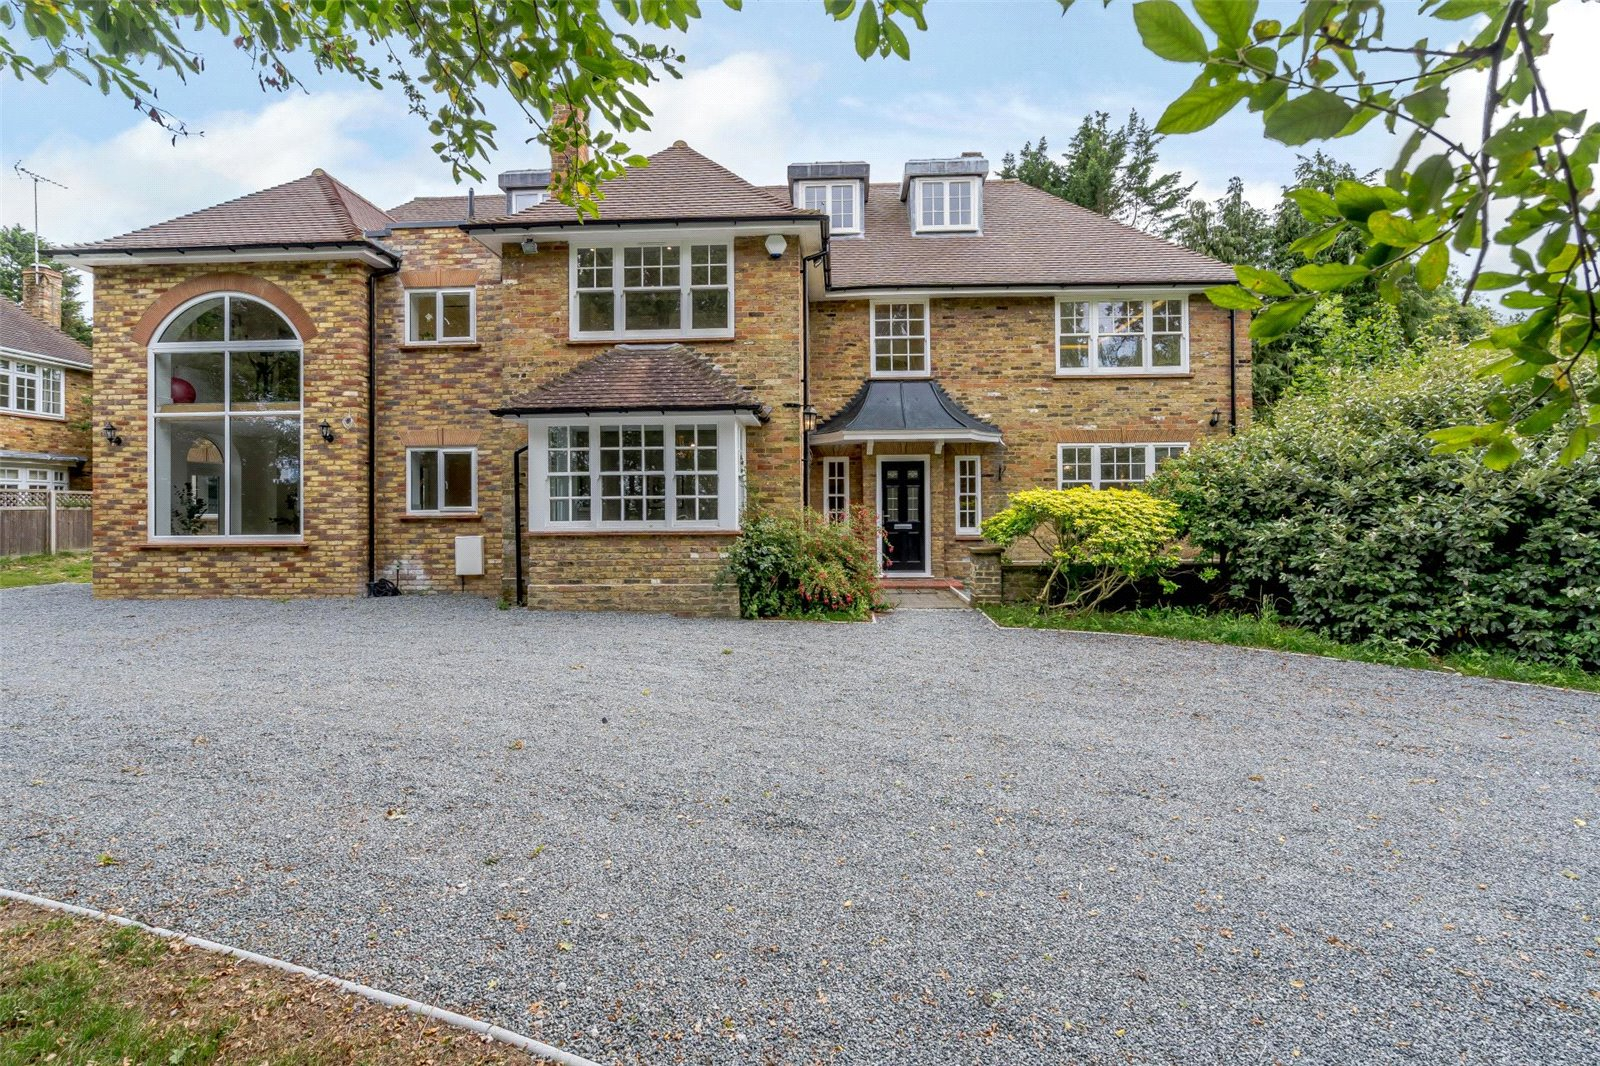 Rickmansworth, Hertfordshire, 5 Bedrooms